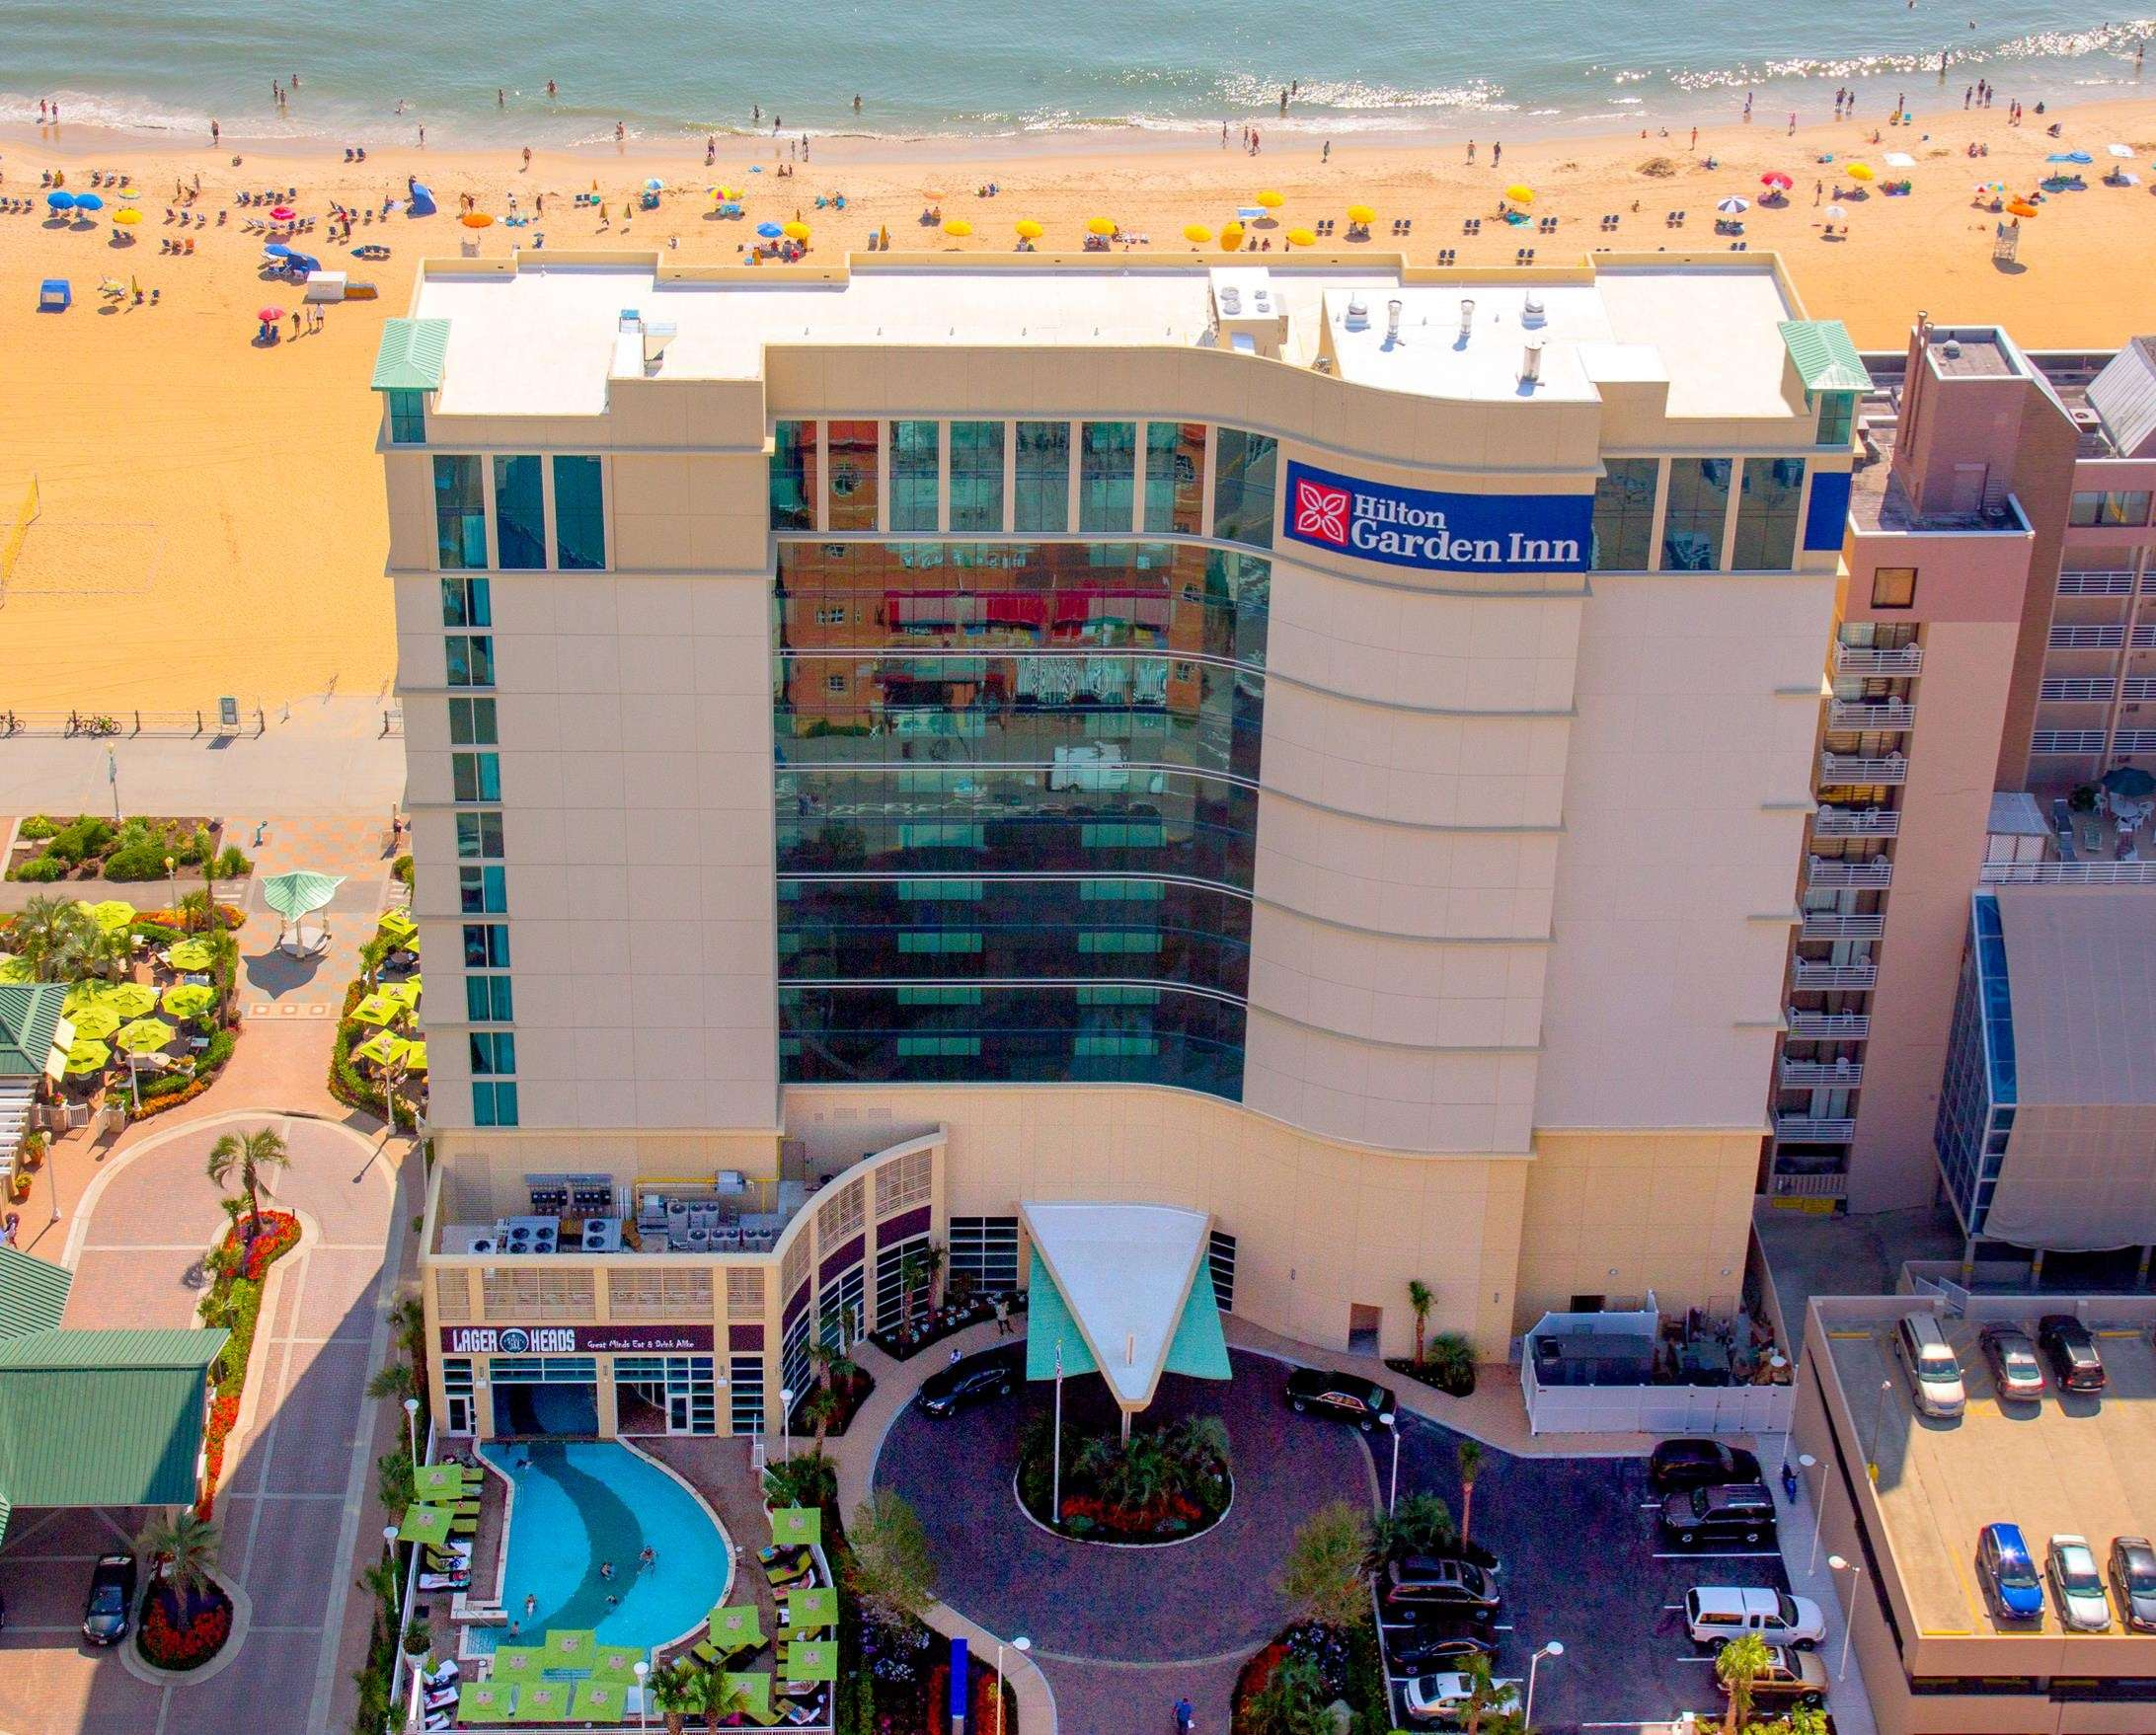 Hilton Garden Inn Virginia Beach Oceanfront image 7